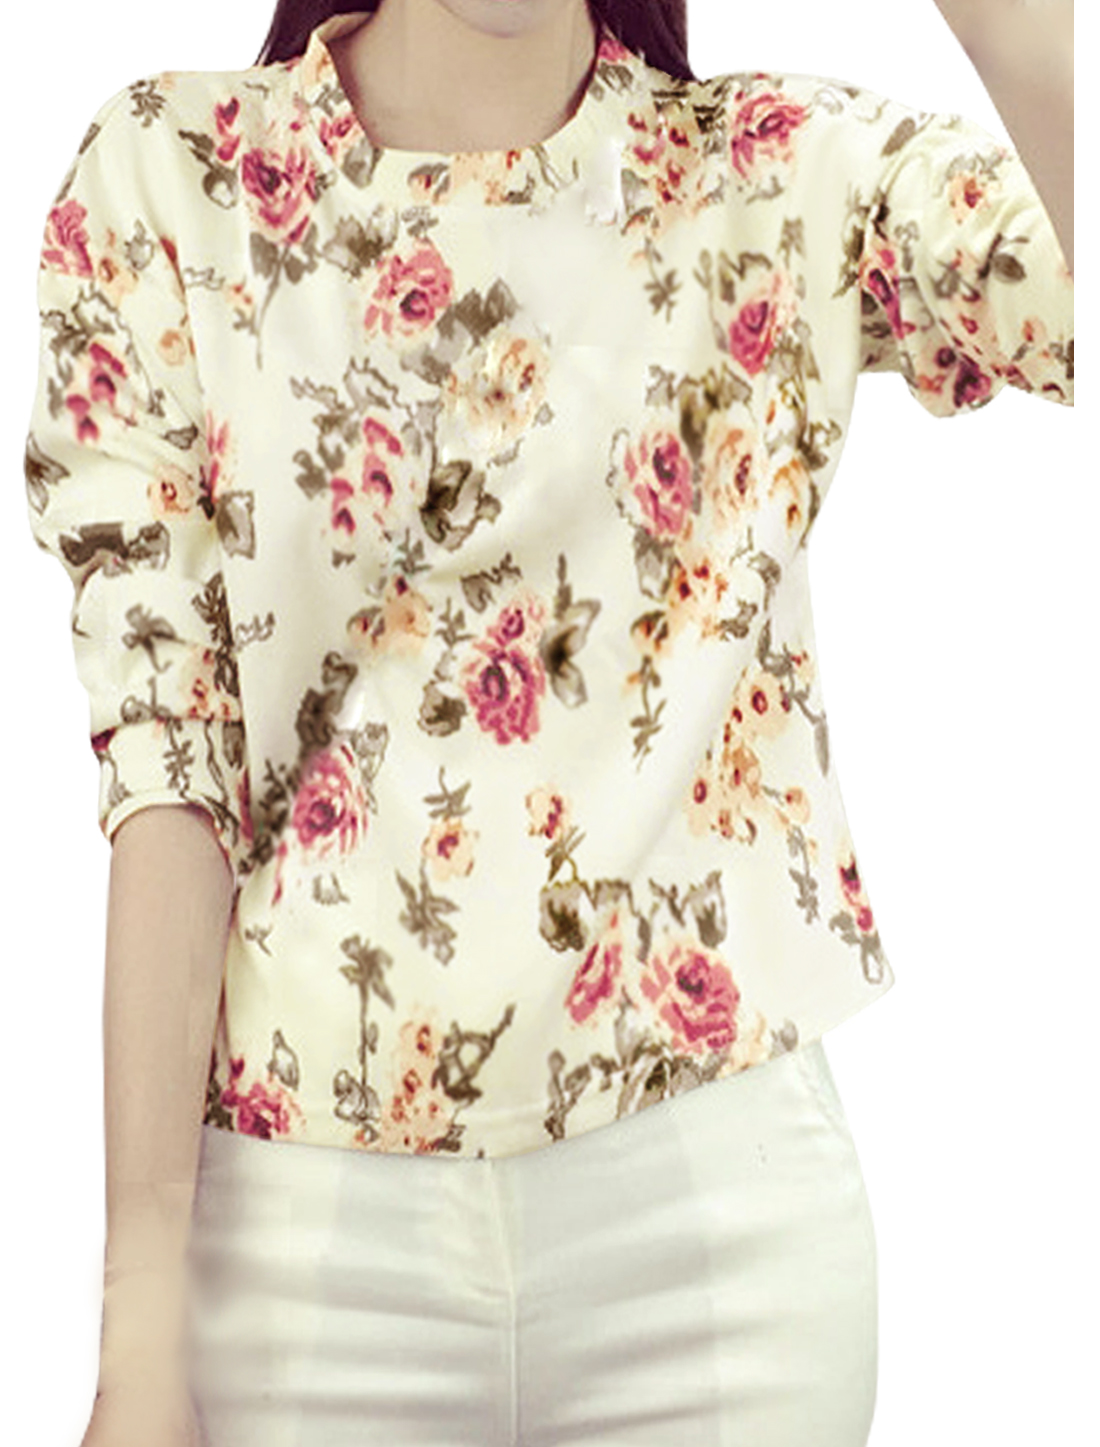 Women Crew Neck Long Sleeves Floral Pattern Chiffon Tee Shirt Beige XS